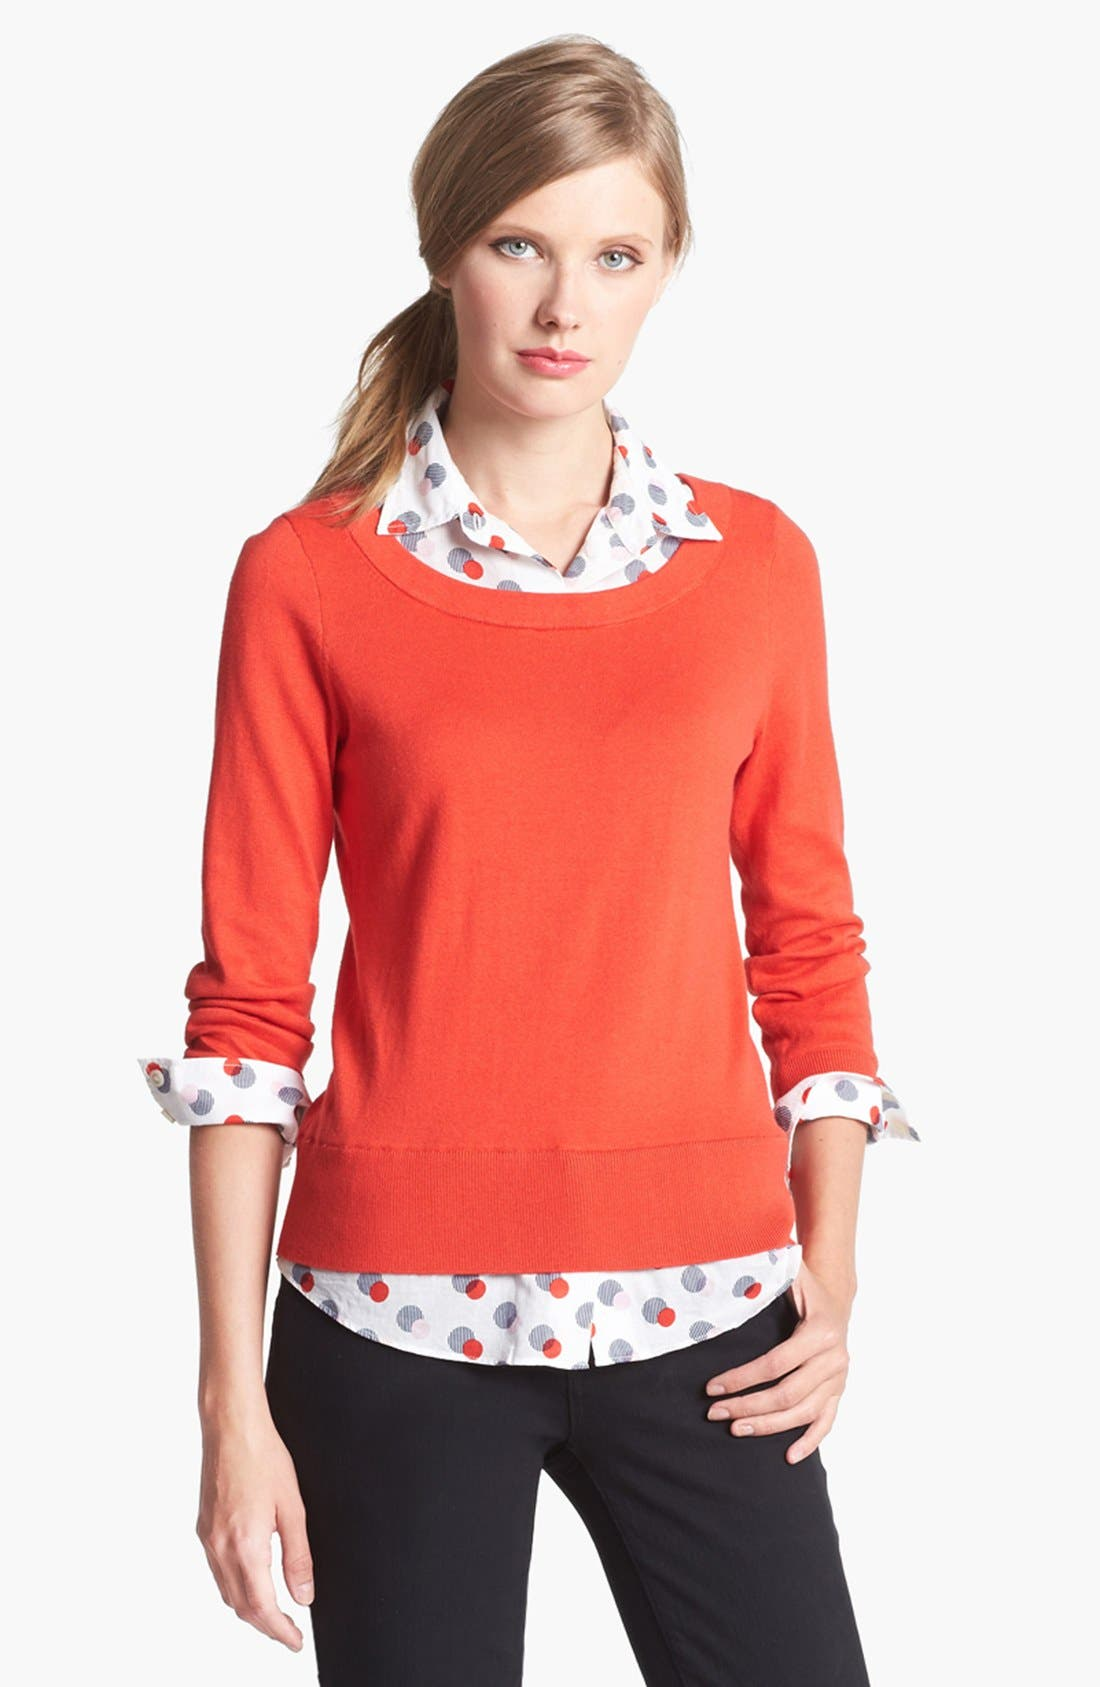 Main Image - kate spade new york 'yardley' layered sweater